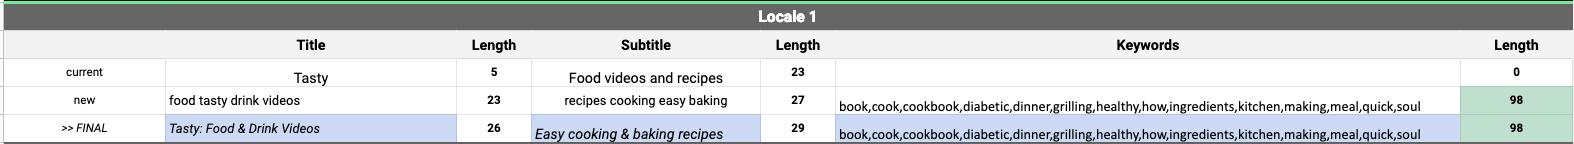 metadata before and after keyword optimization